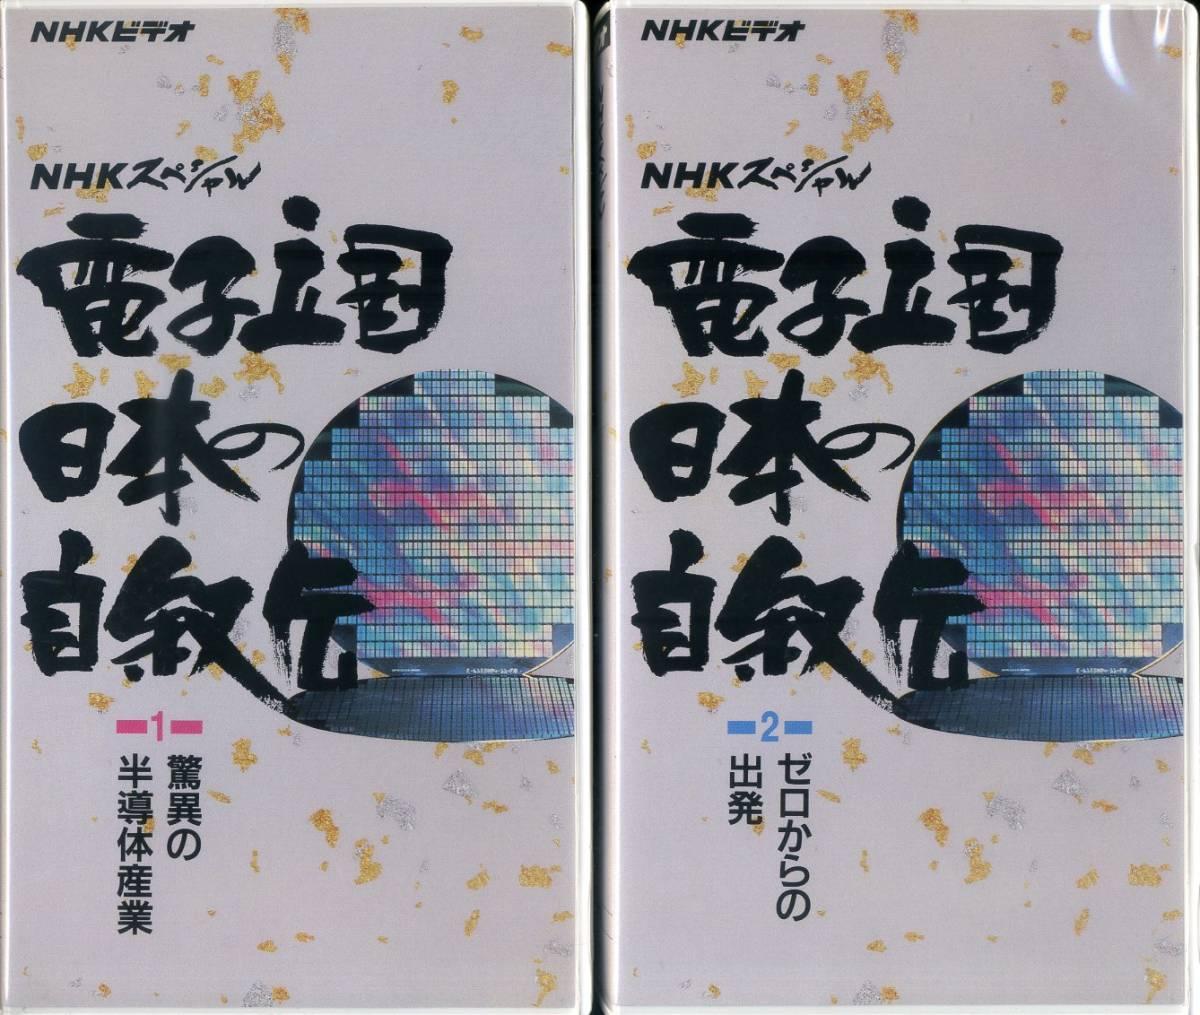 即決〈同梱歓迎〉VHS電子立国日本の自叙伝 全4巻(計4本揃) NHKビデオ◎その他多数出品中∞3167_画像3